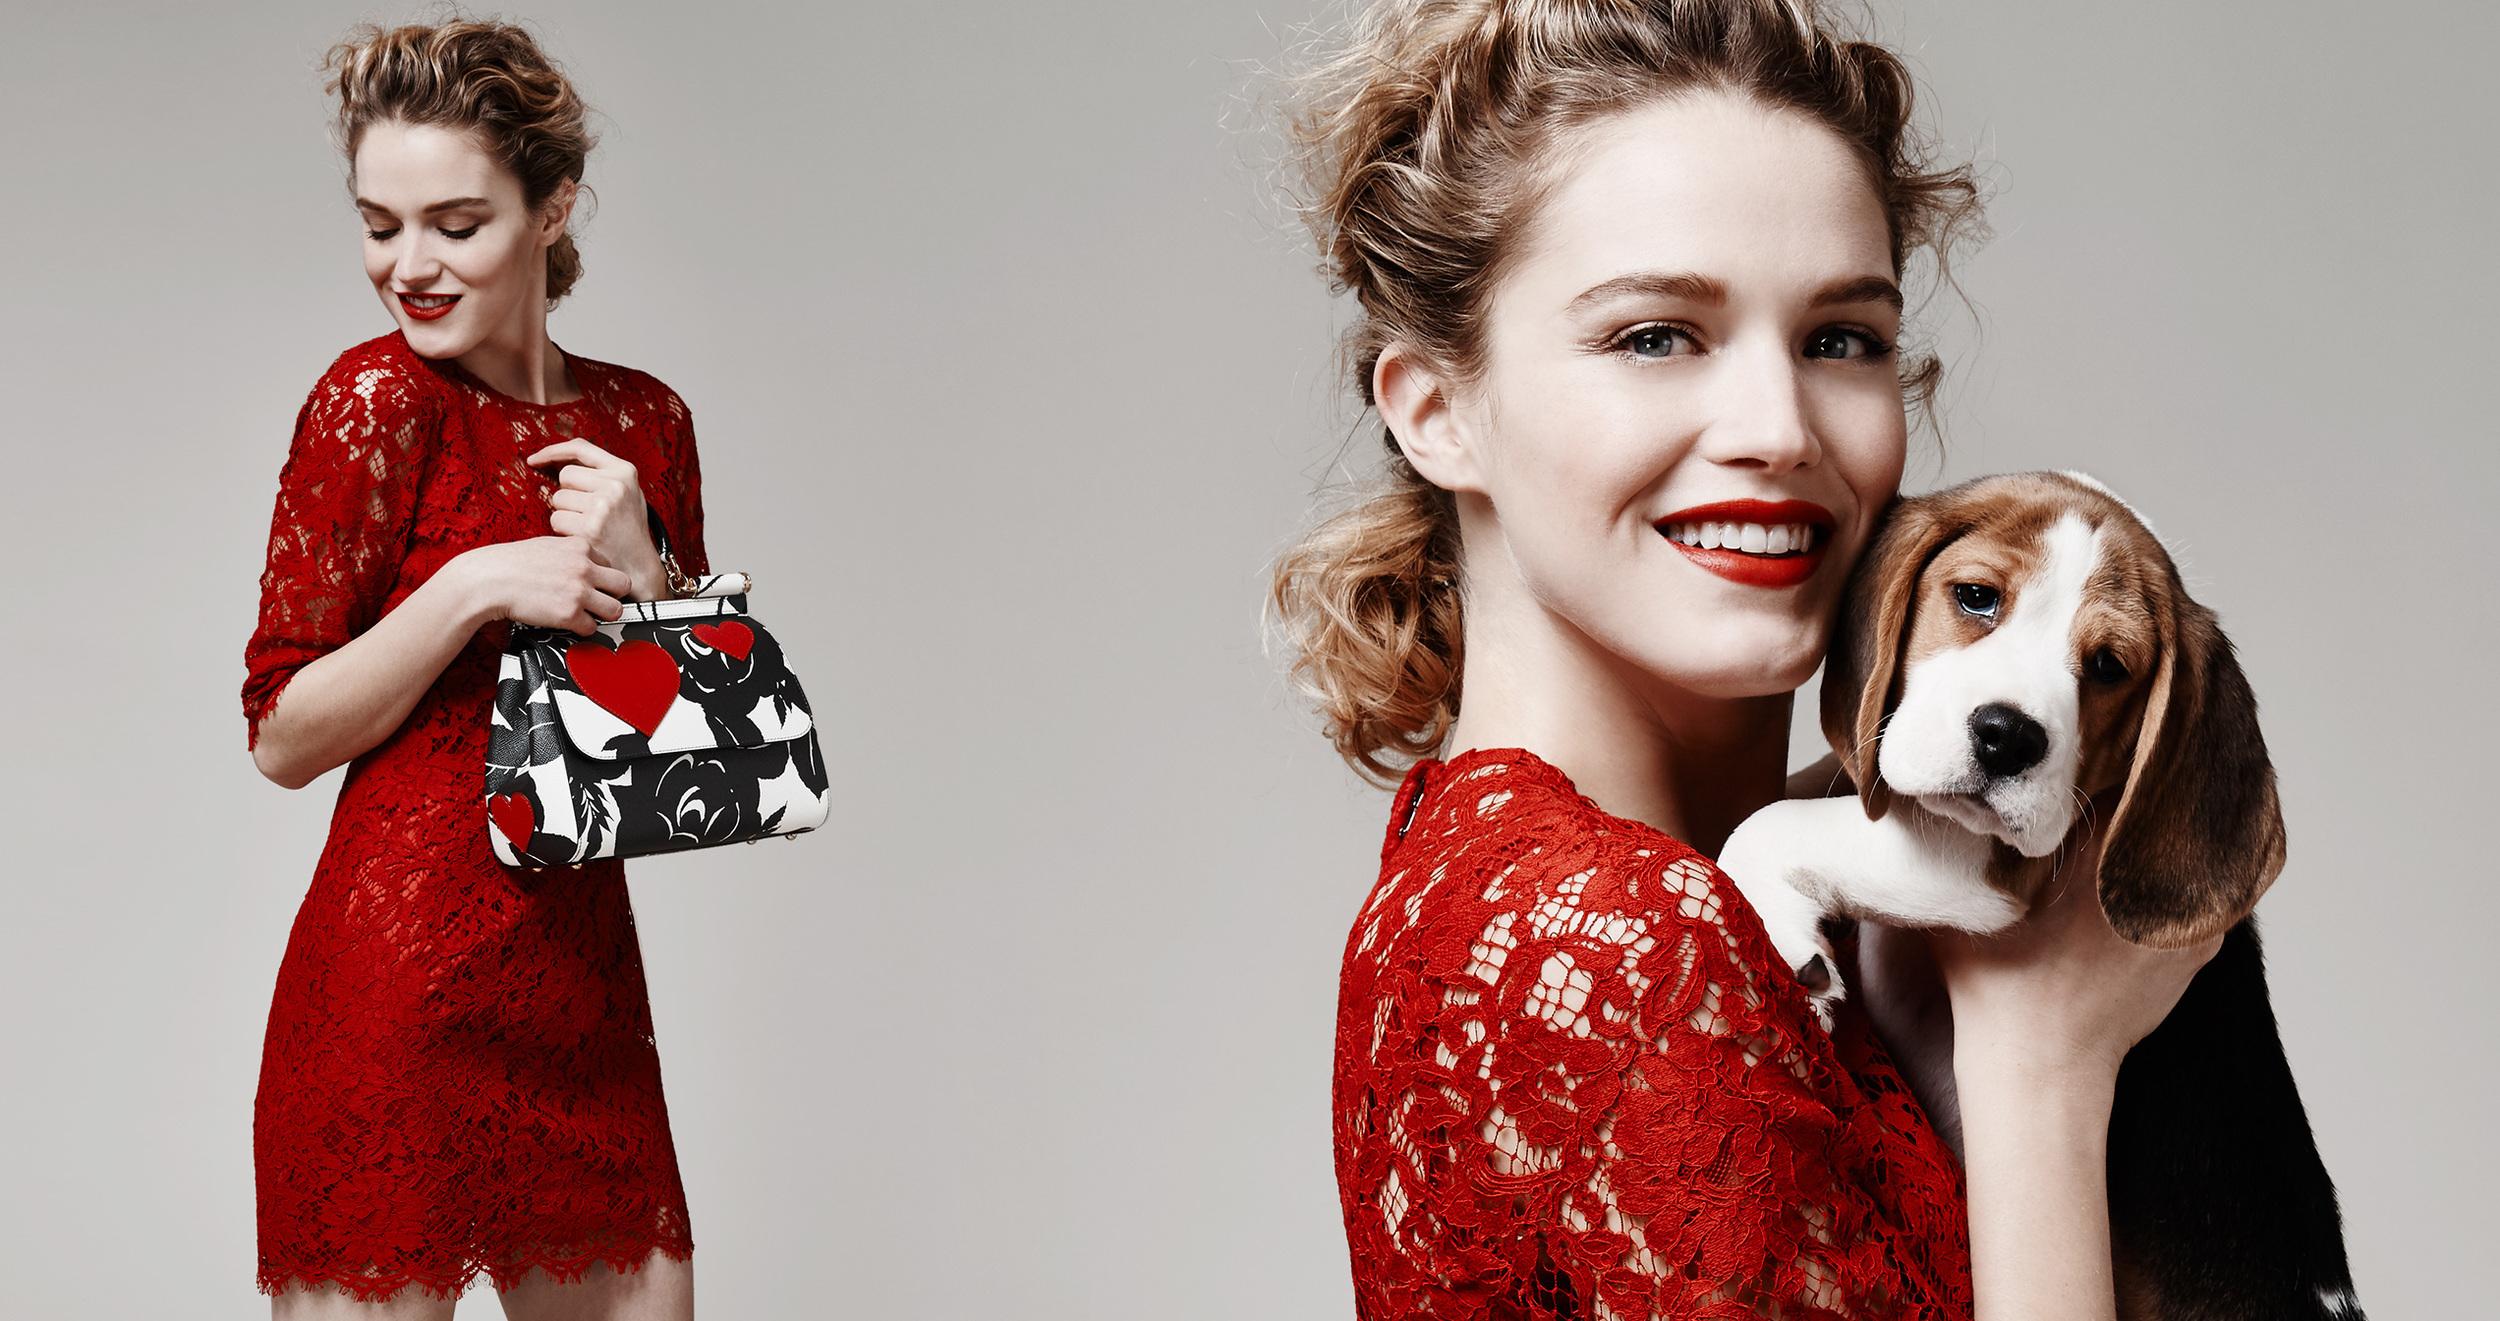 Dolce_Gabbana_Apparel_Handbags_WRTW_1136156825_SUPERHERO_VALENTINES_DAY_EDITORIAL_CAPTURE_217_COMP.jpg